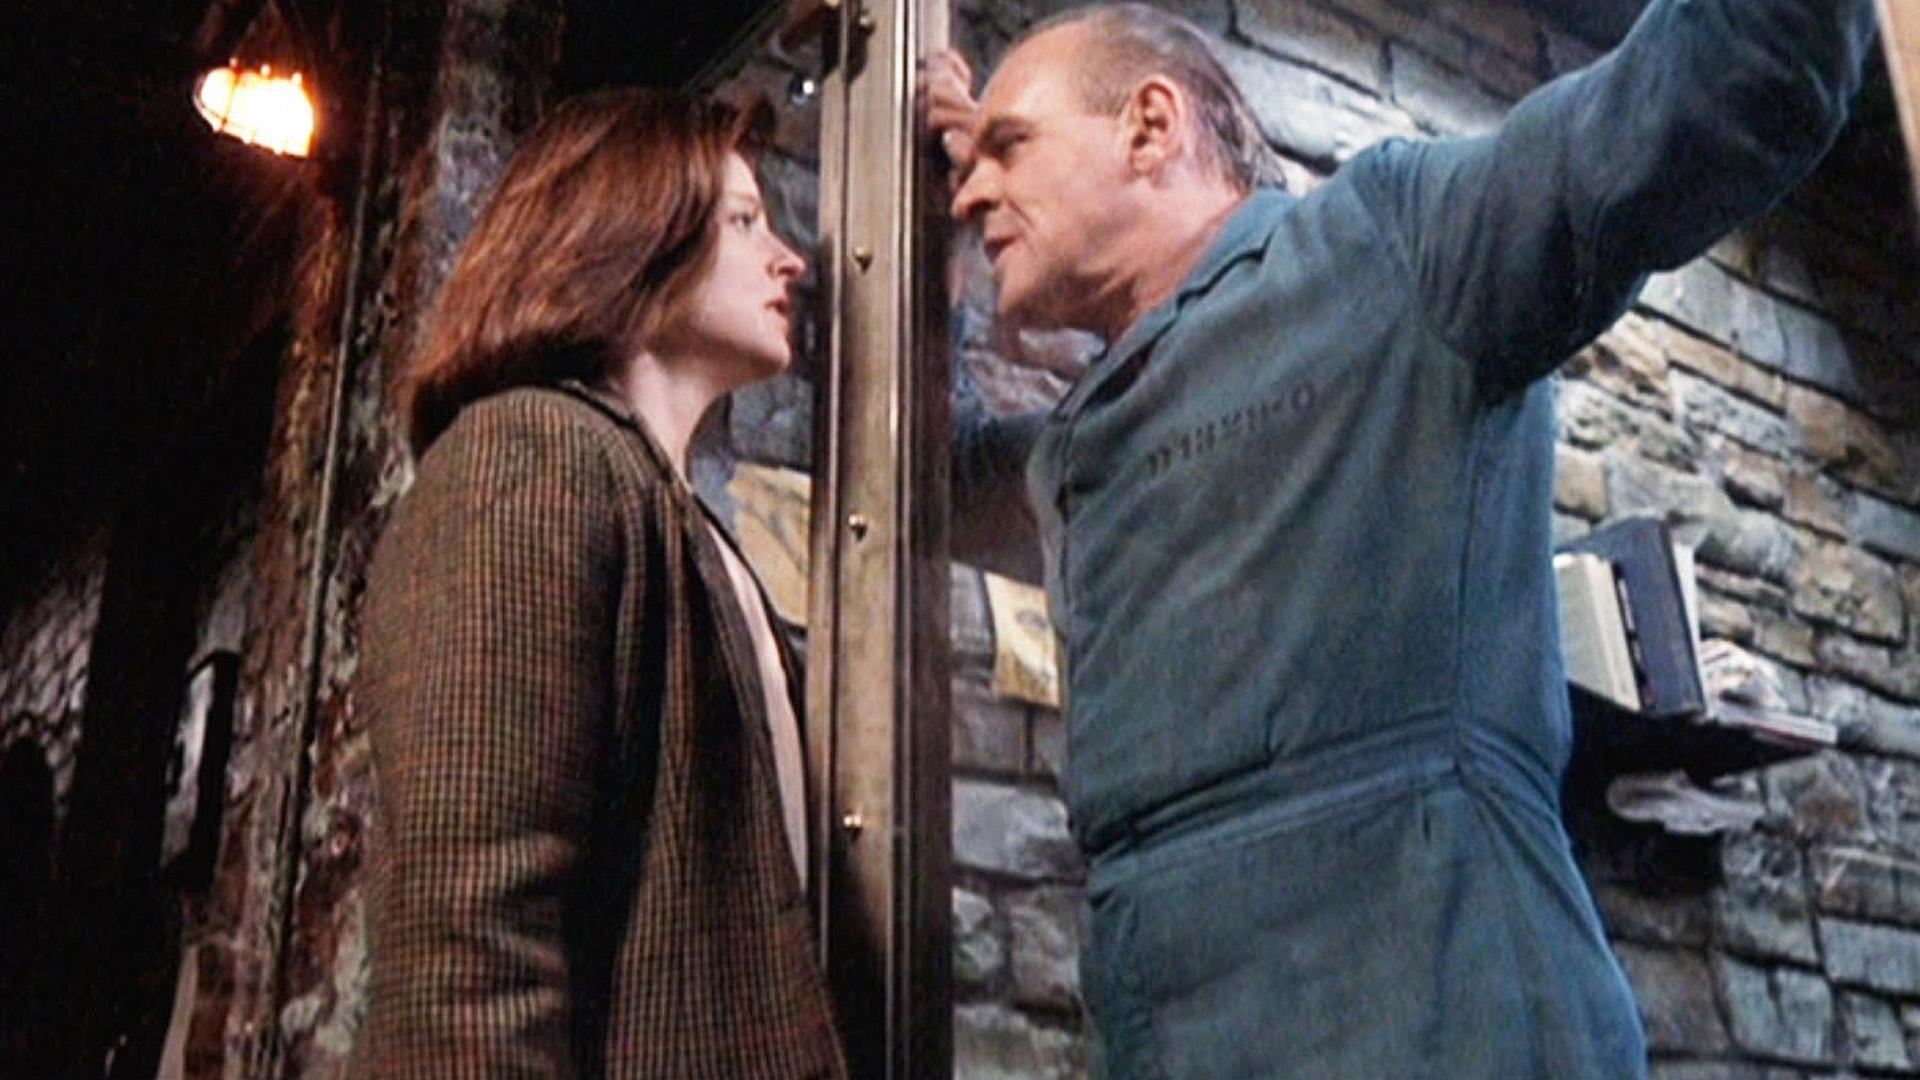 The Silence Of The Lambs Recut As A Romantic Comedy Geektyrant